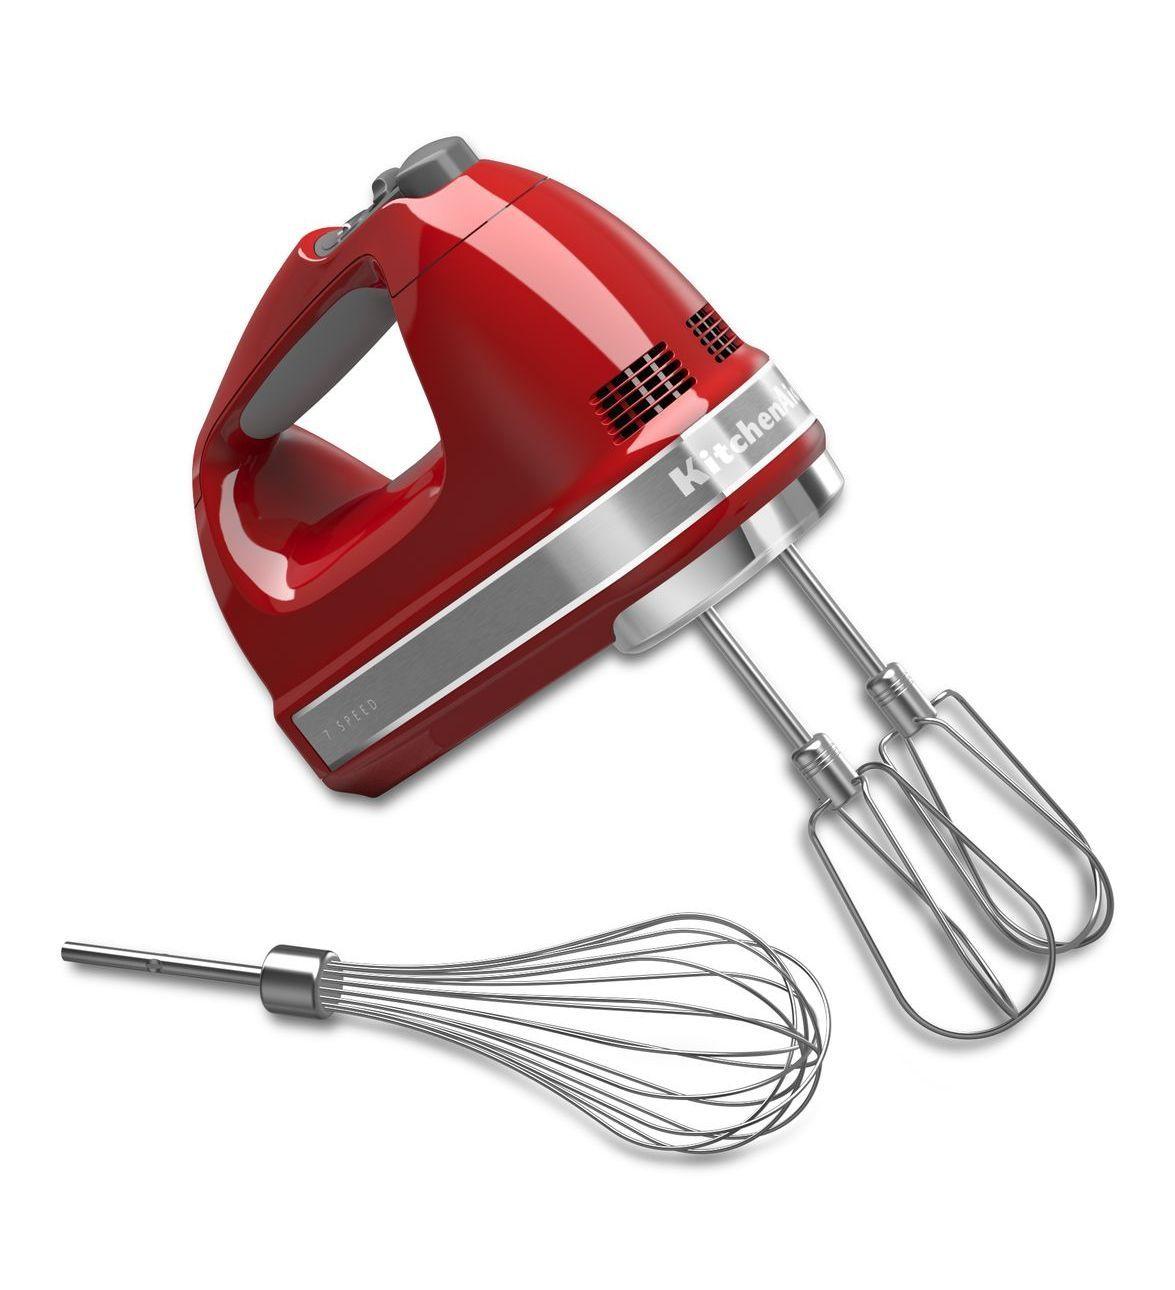 Contour Silver 7 Speed Hand Mixer Khm7210cu Kitchenaid Kitchen Aid Hand Mixer Kitchen Aid Hand Mixer